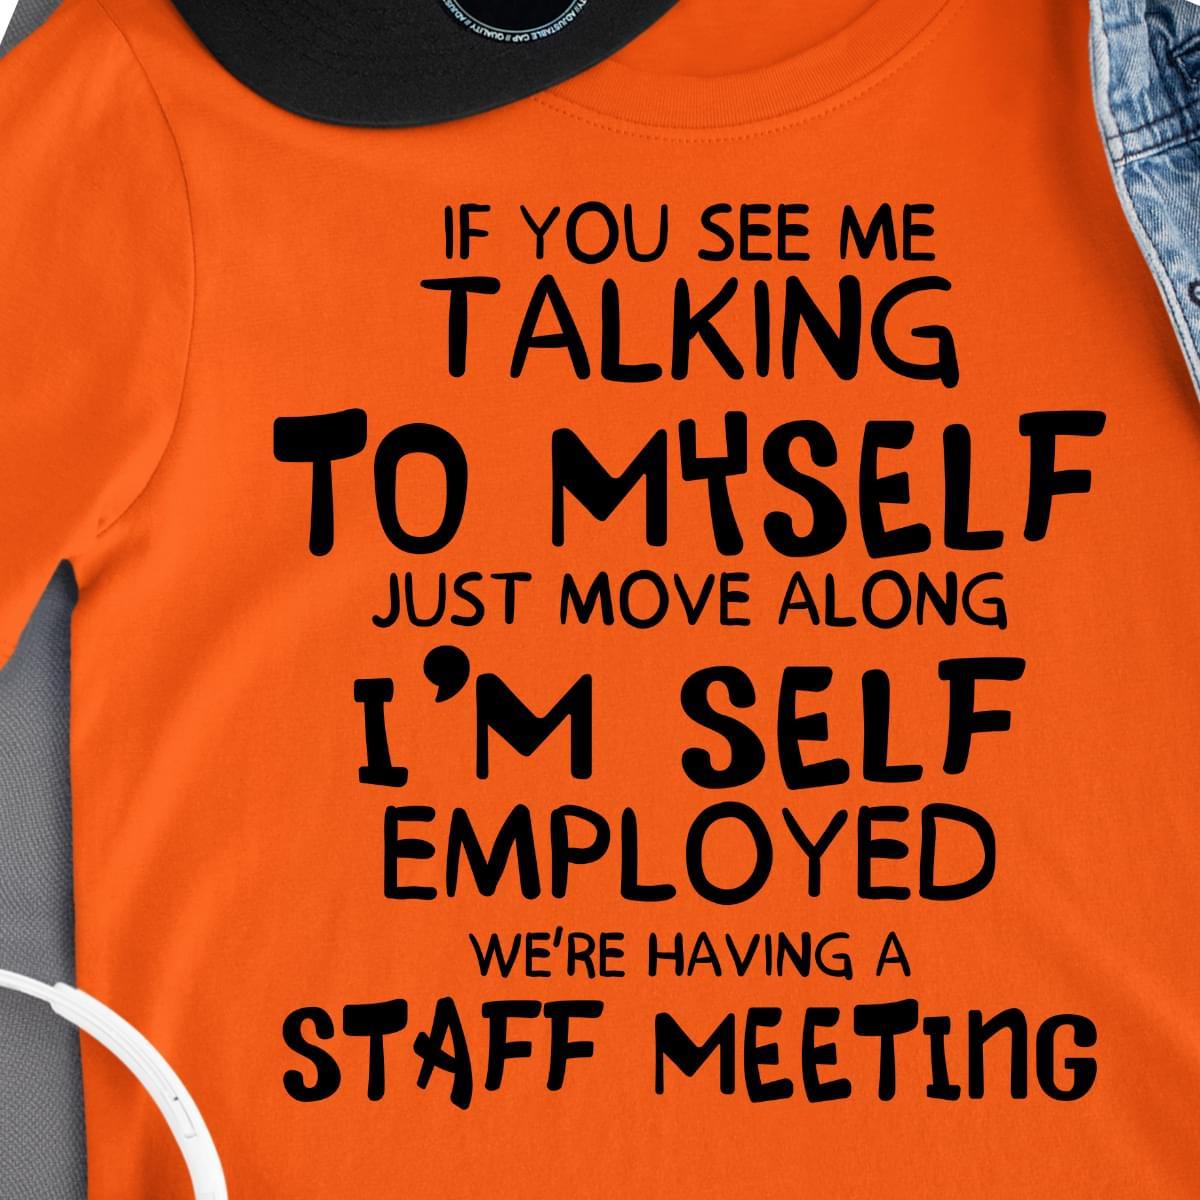 If You See Me Talking To Myself Just Move Along Im Self Employed Were Having Staff Meeting cotton t-shirt Hoodie Mug